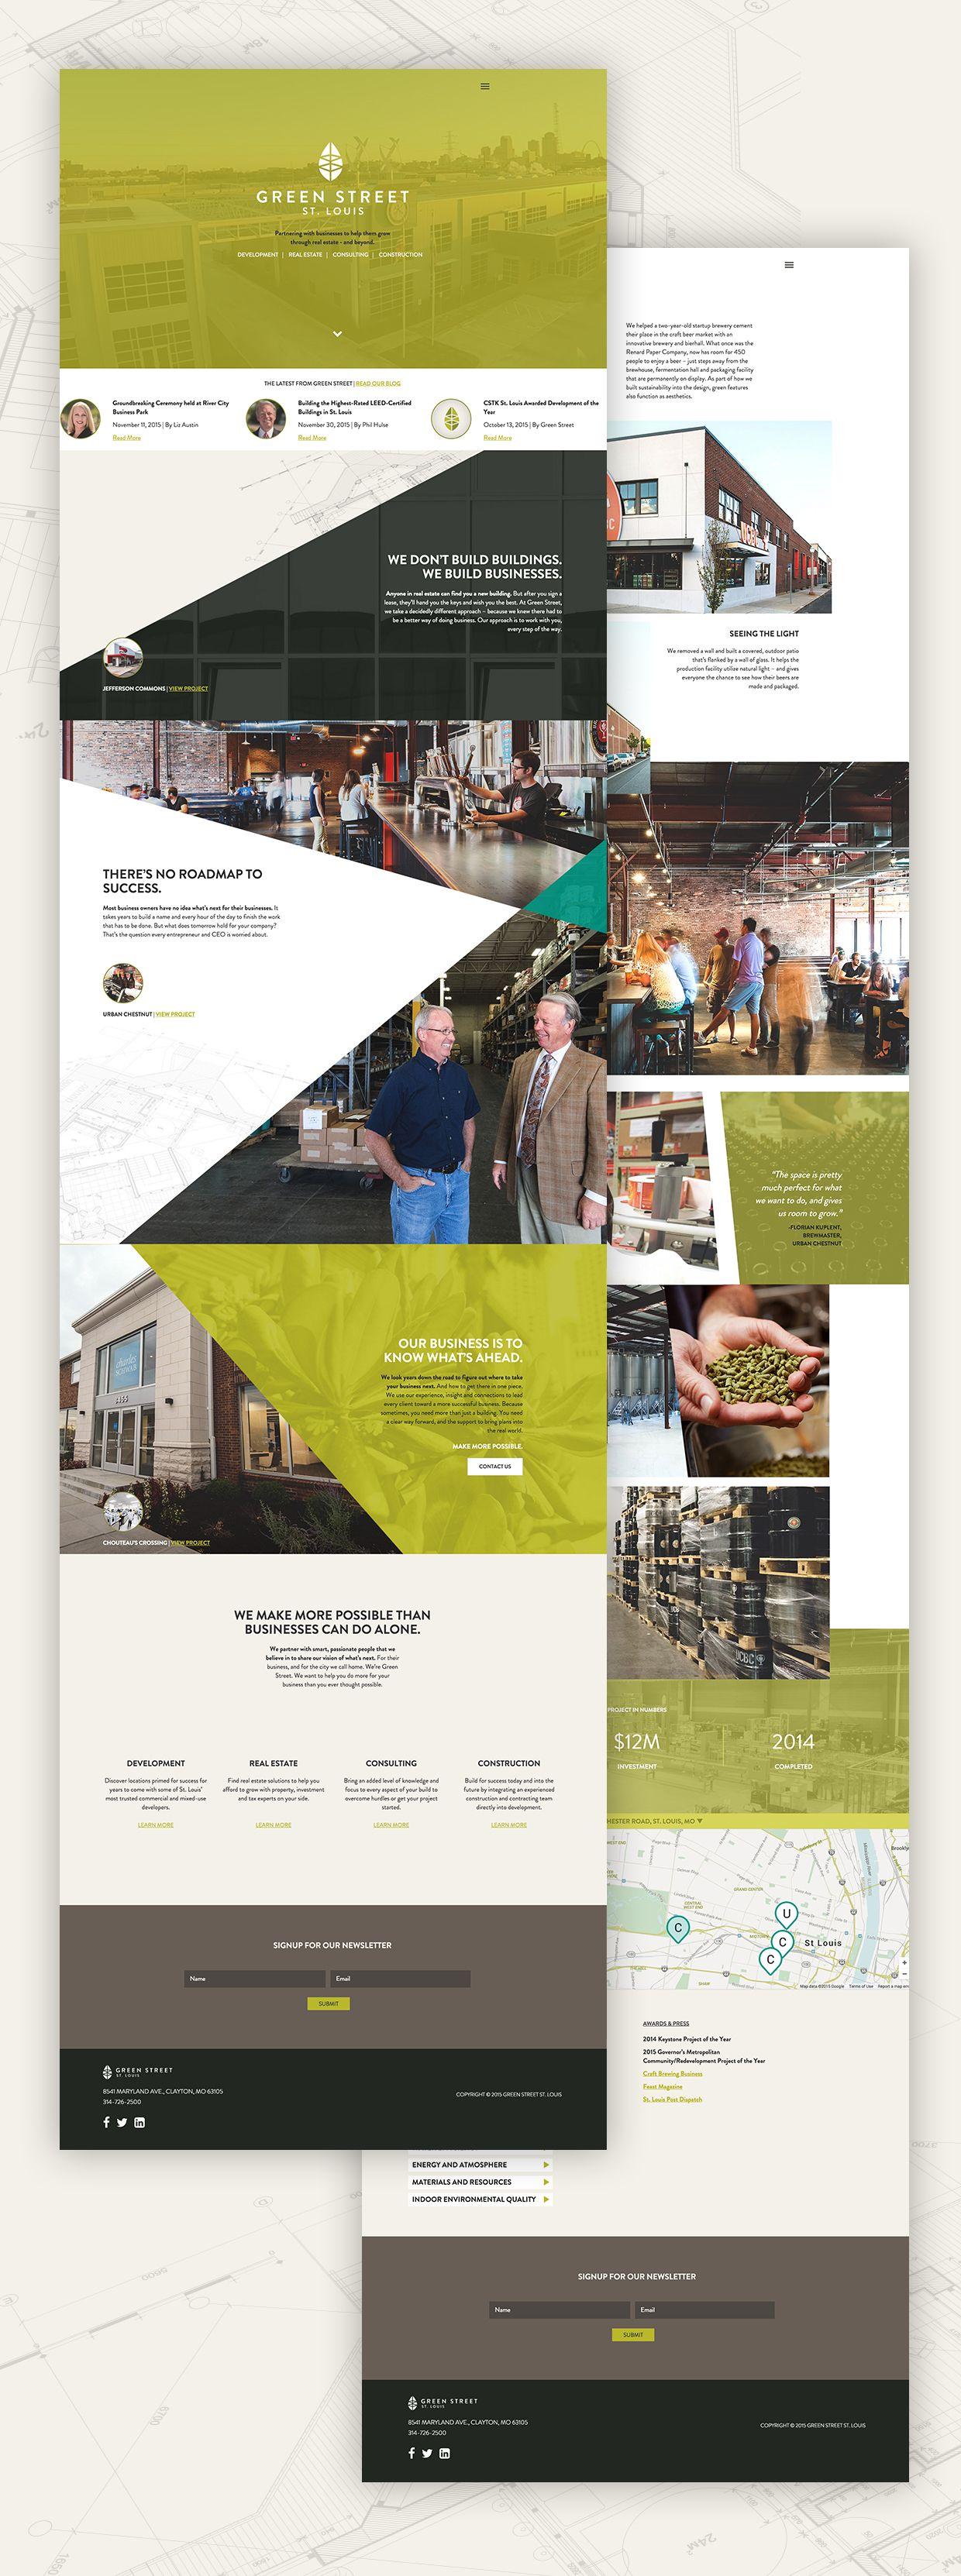 Building For The Future New Branding And Website For Green Street St Louis Green Street Street Brands Branding